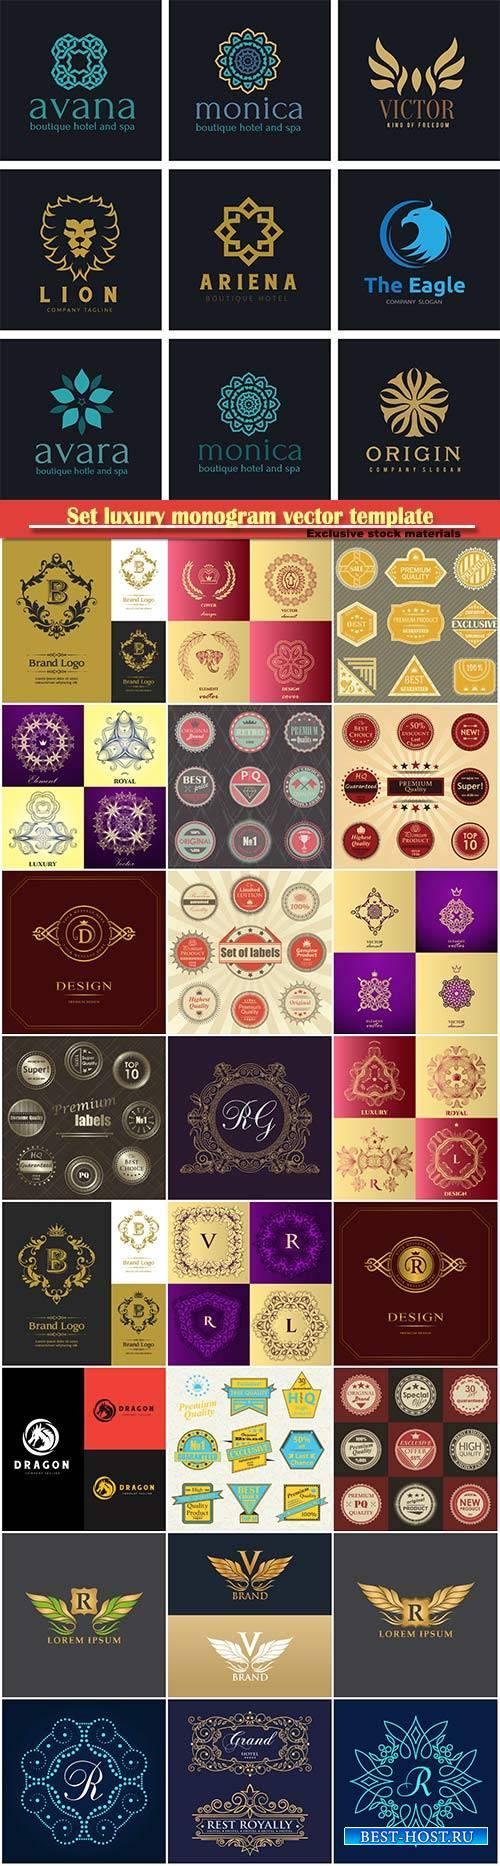 Set luxury monogram vector template, logos, badges, symbols # 6